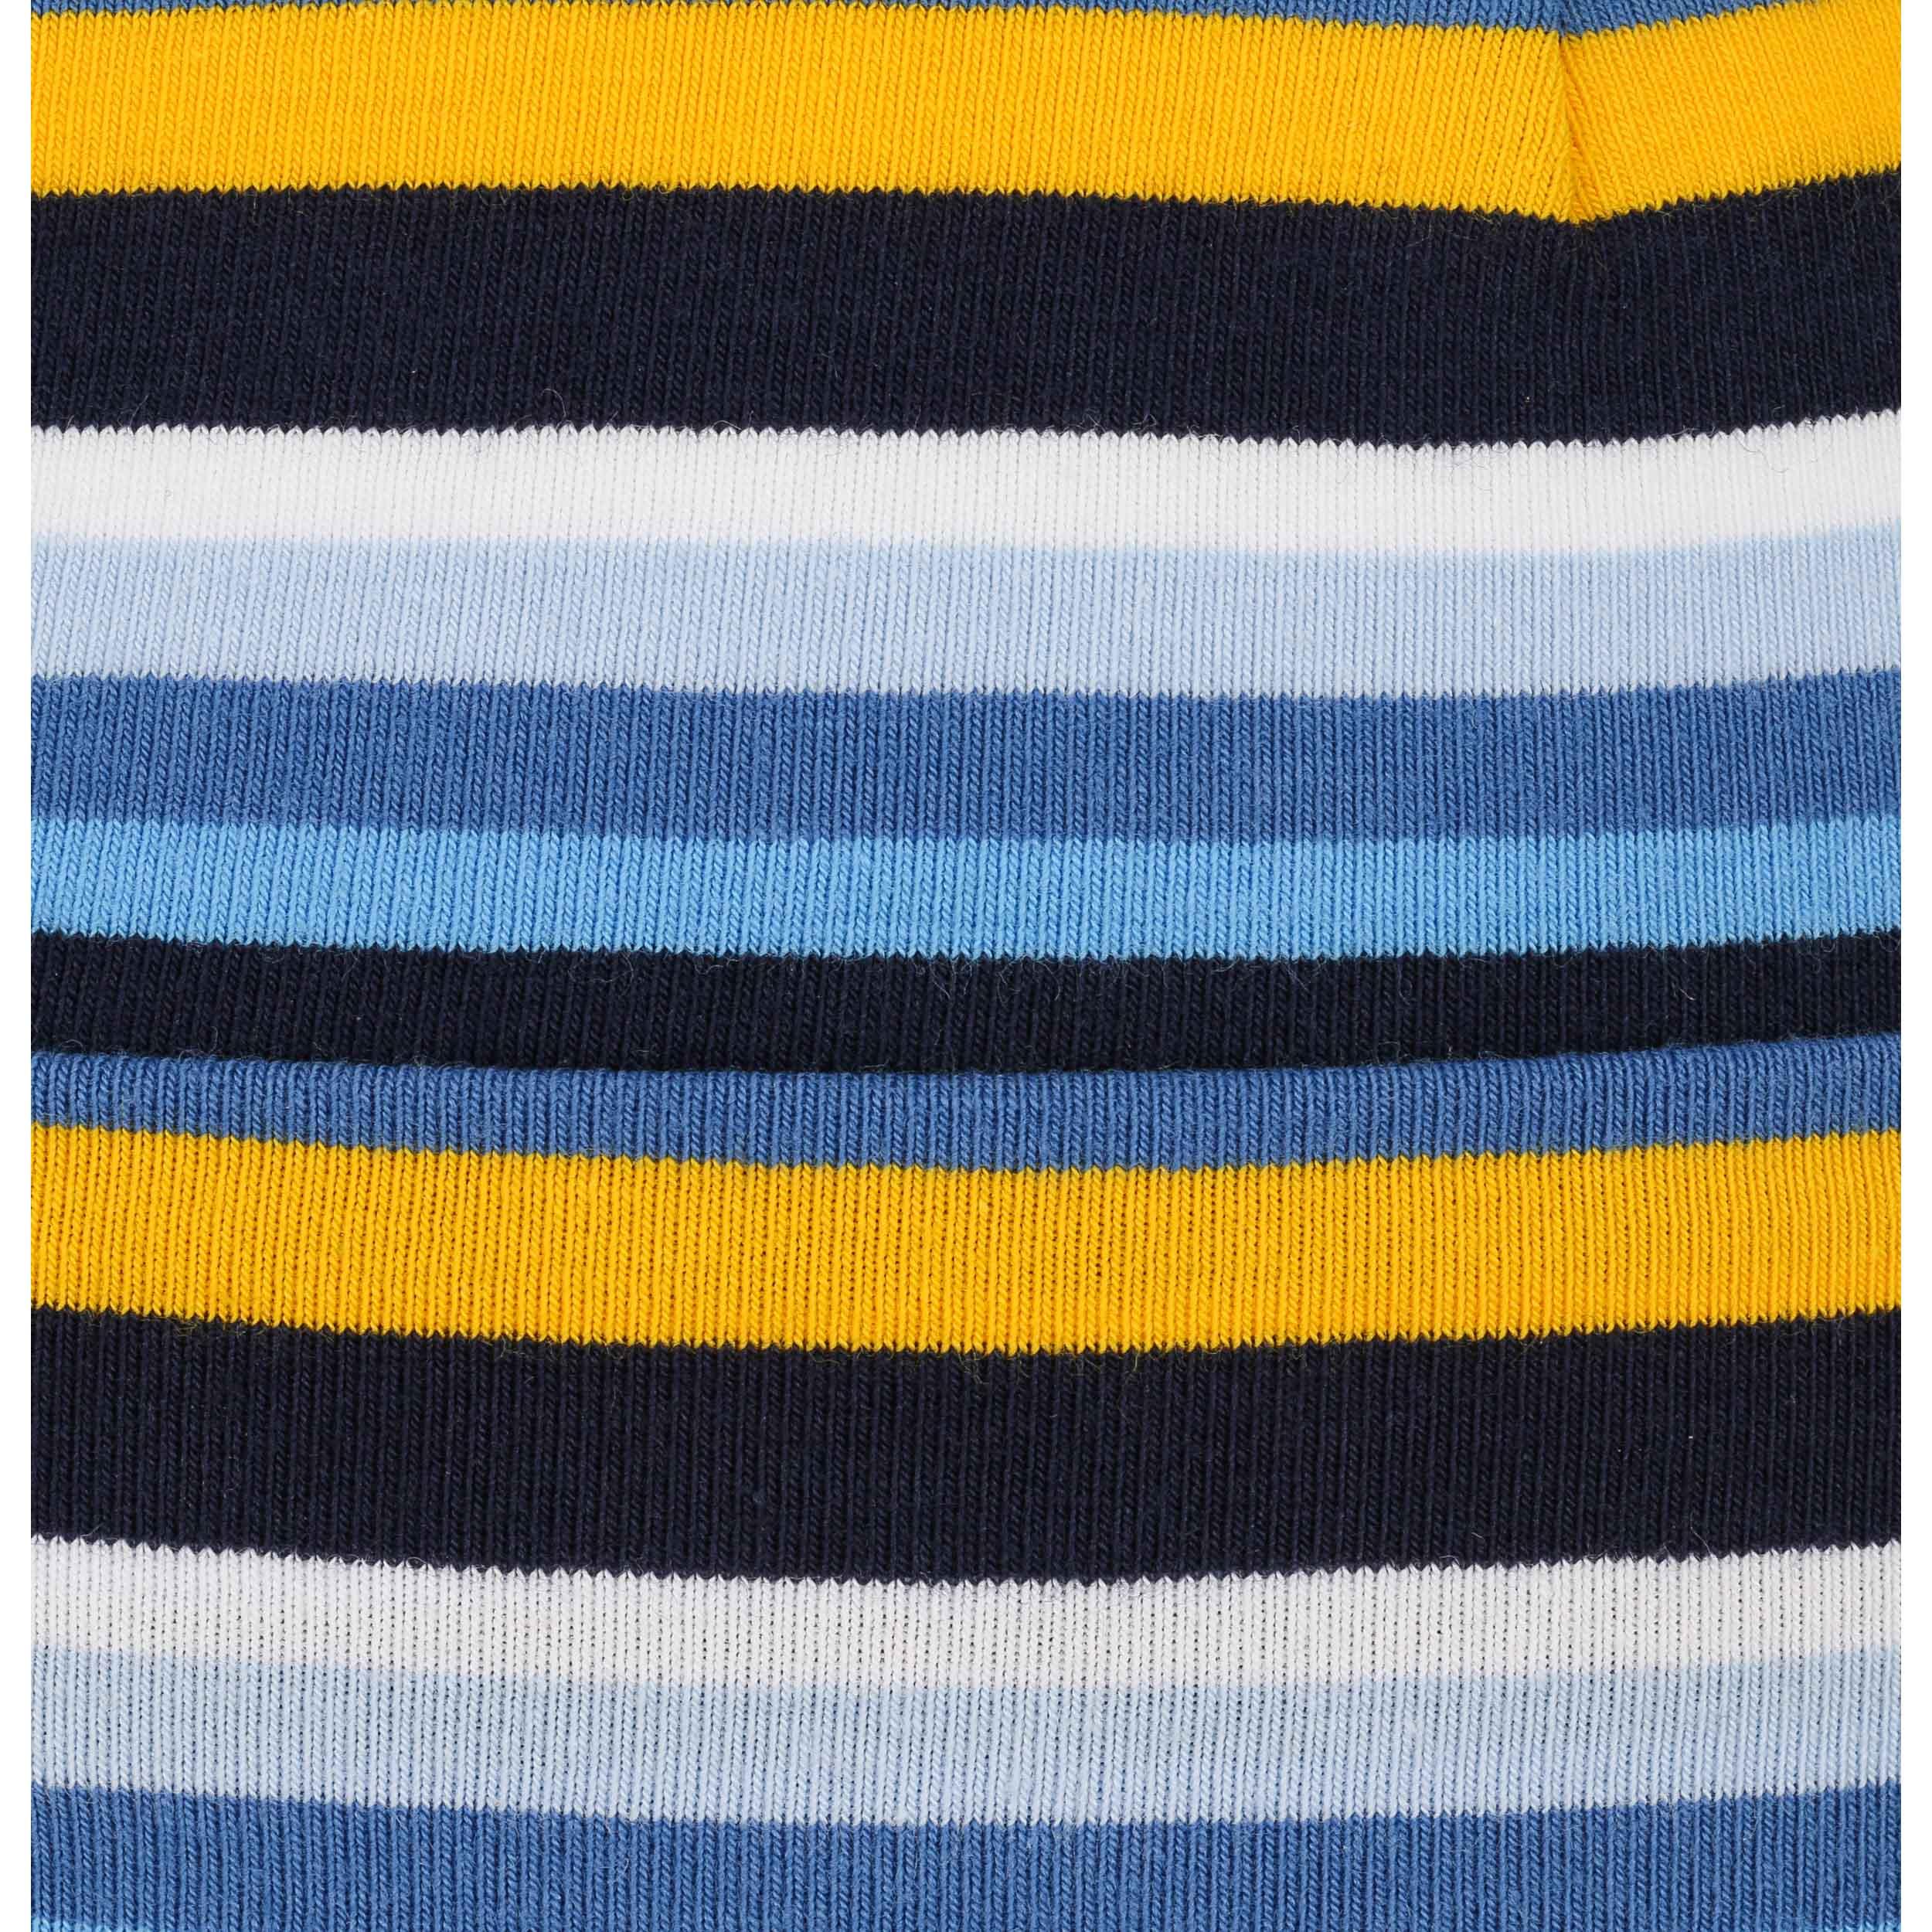 c4c769cb39c ... Jersey Stripes Kids Peak Hat by maximo - blue 3 ...